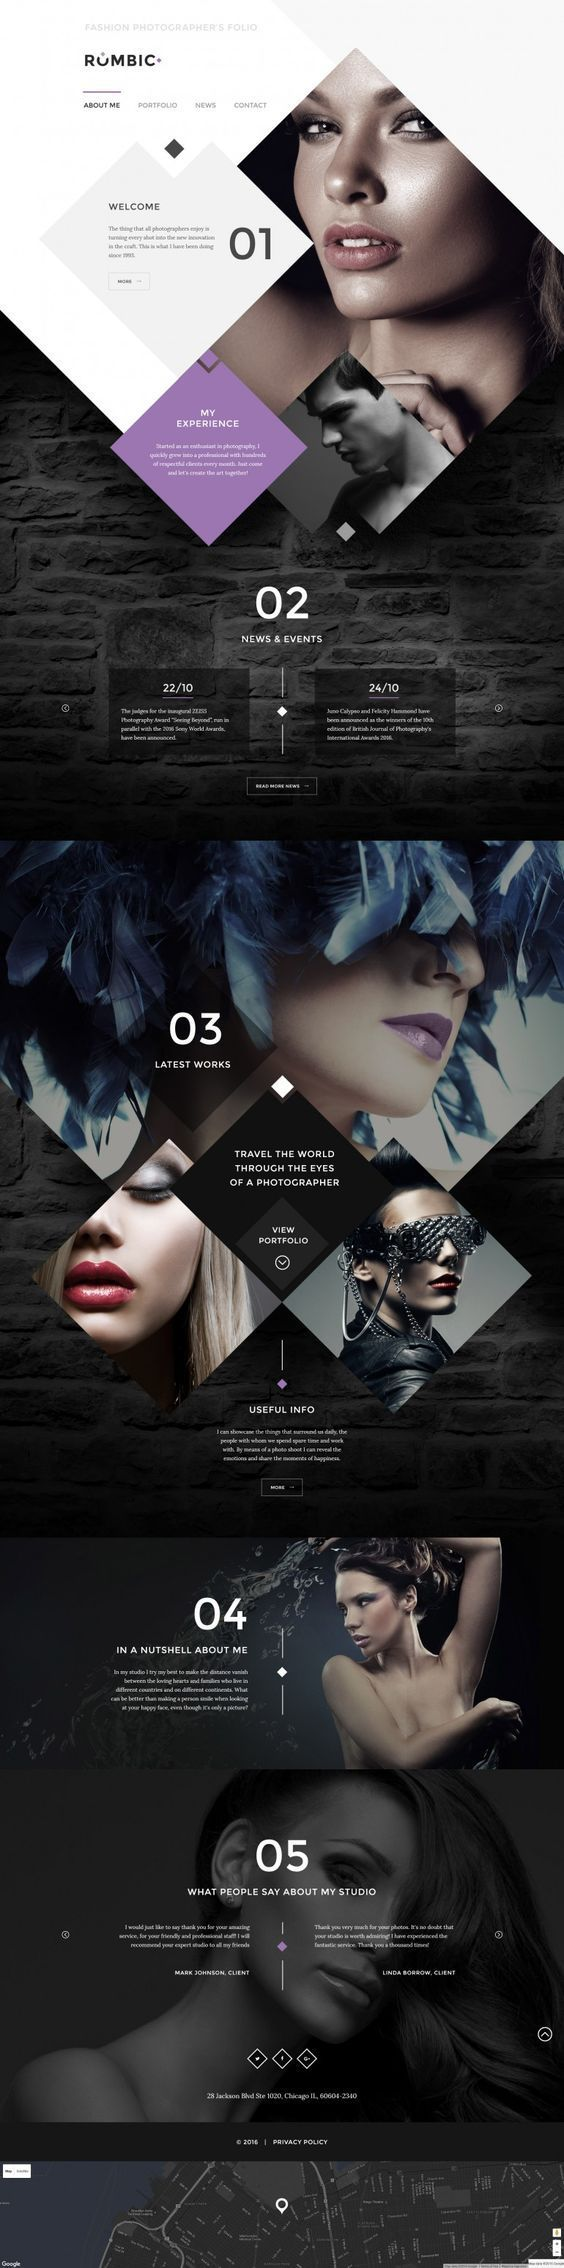 Rumbic Web Design | Fivestar Branding – Design and Branding Agency & Inspiration Gallery